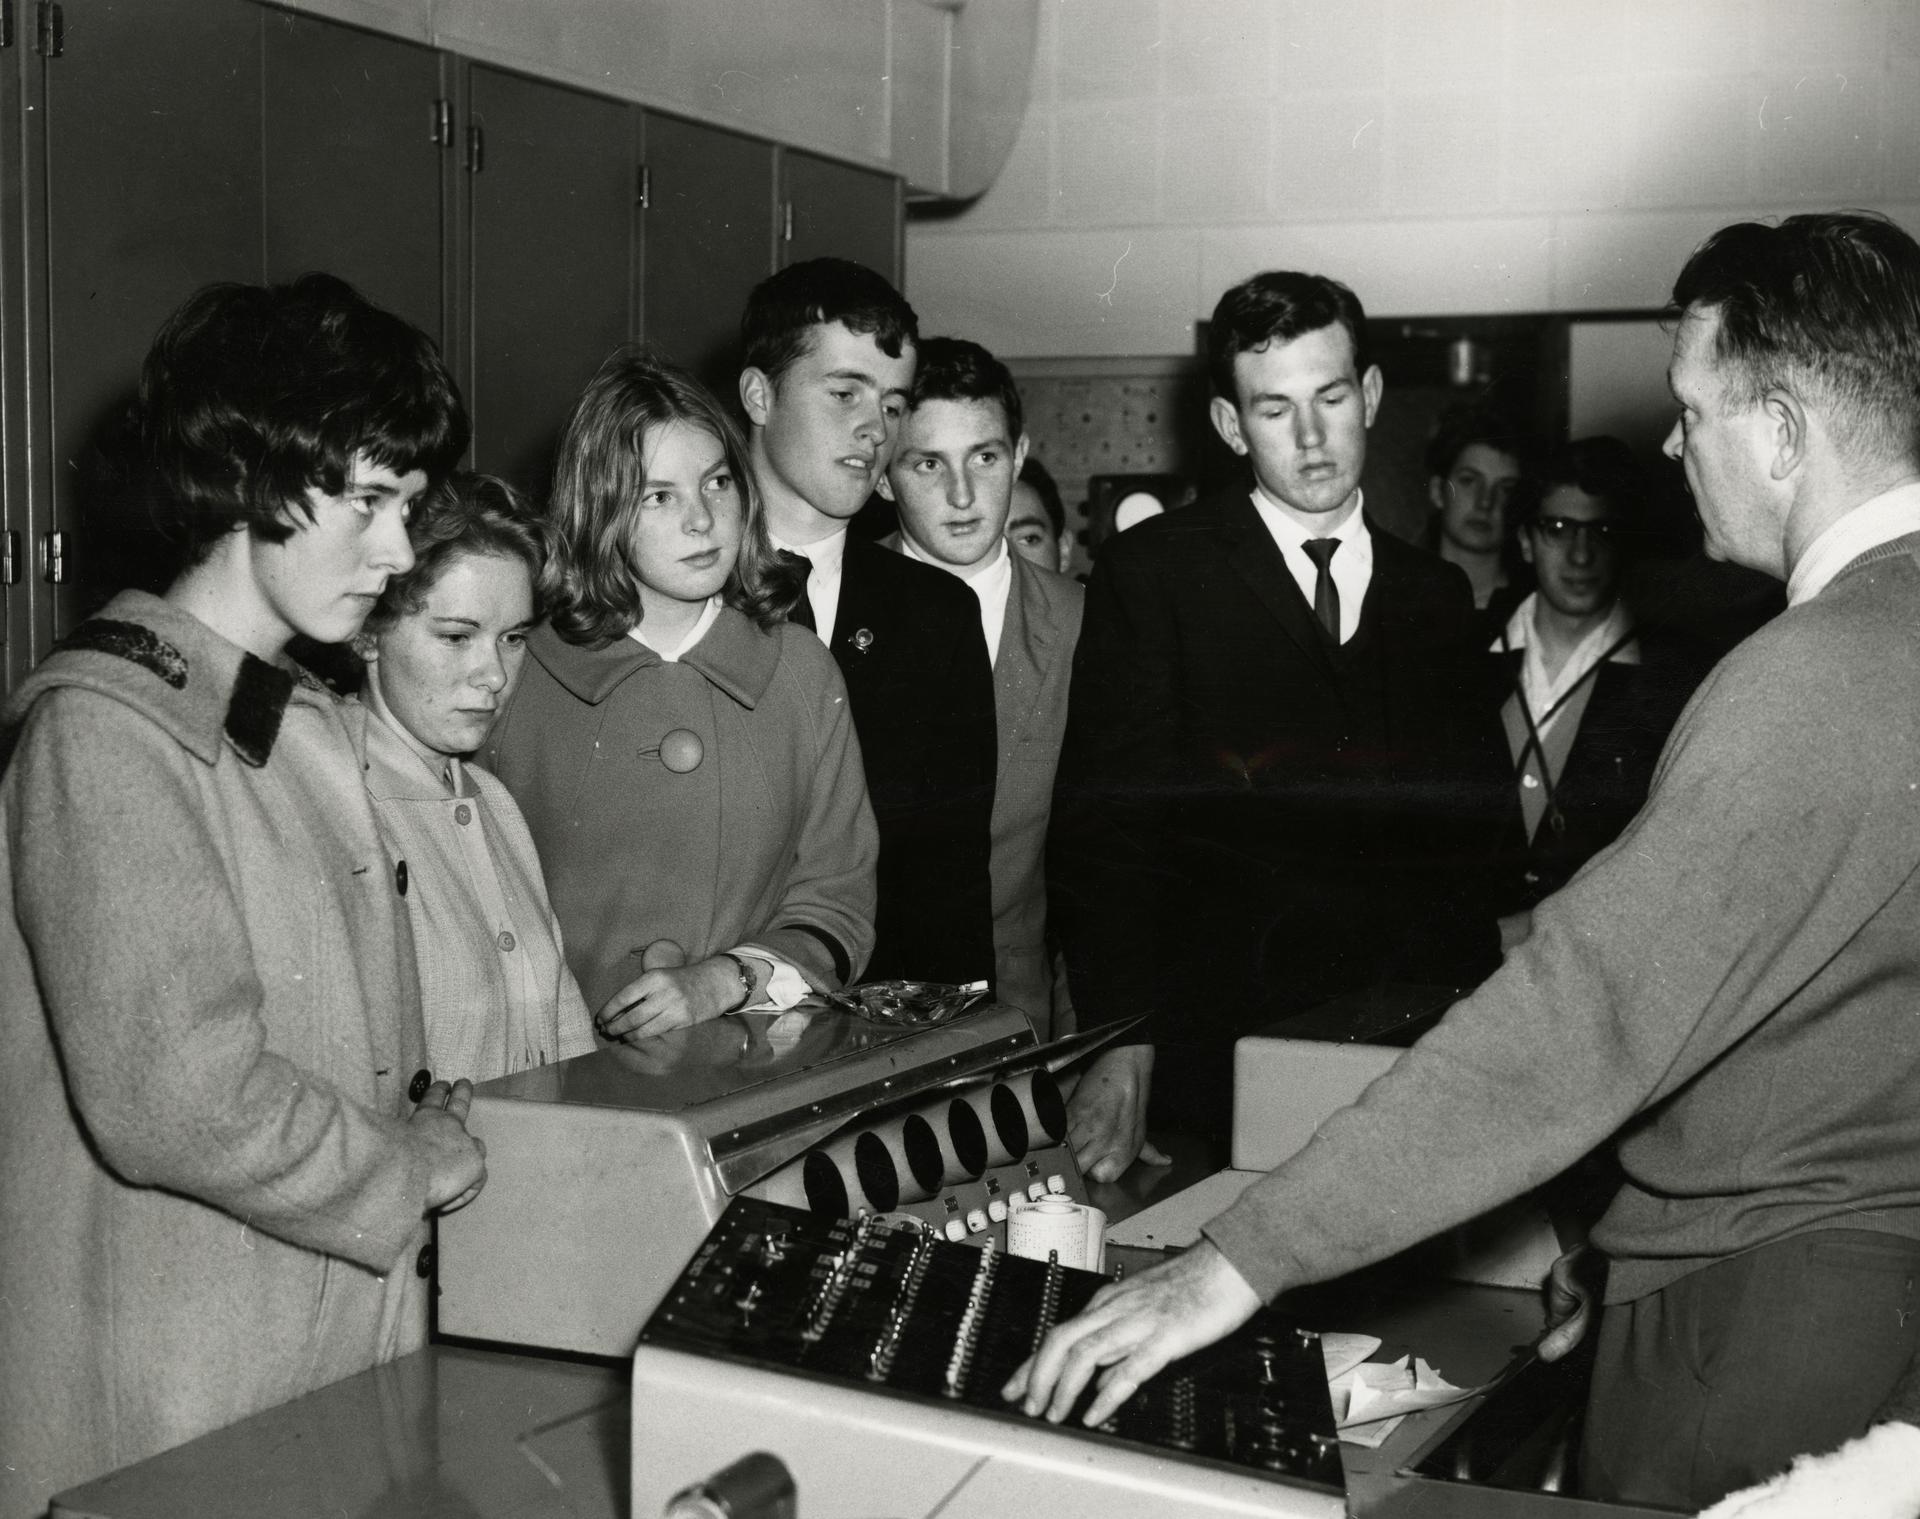 Secondary School students examine computer equipment, Open day 1963